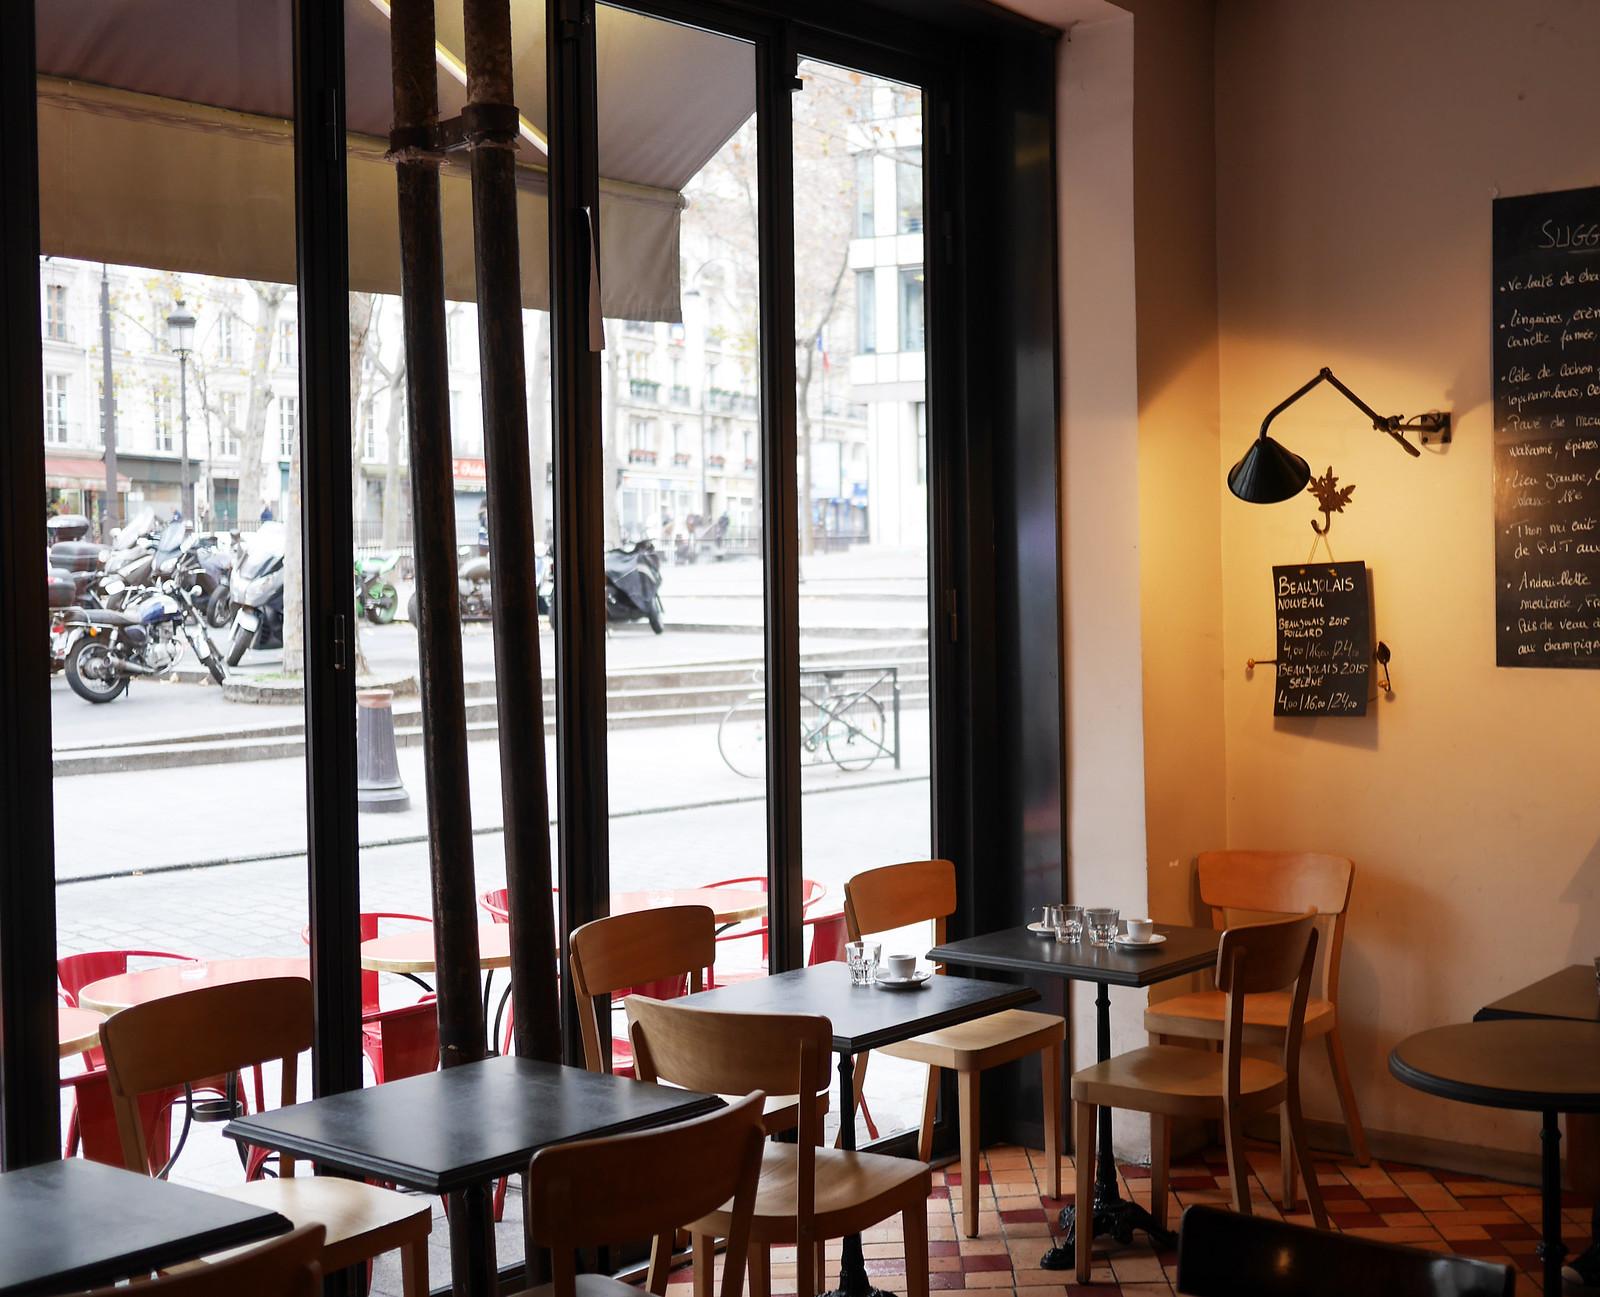 Breakfast in Paris